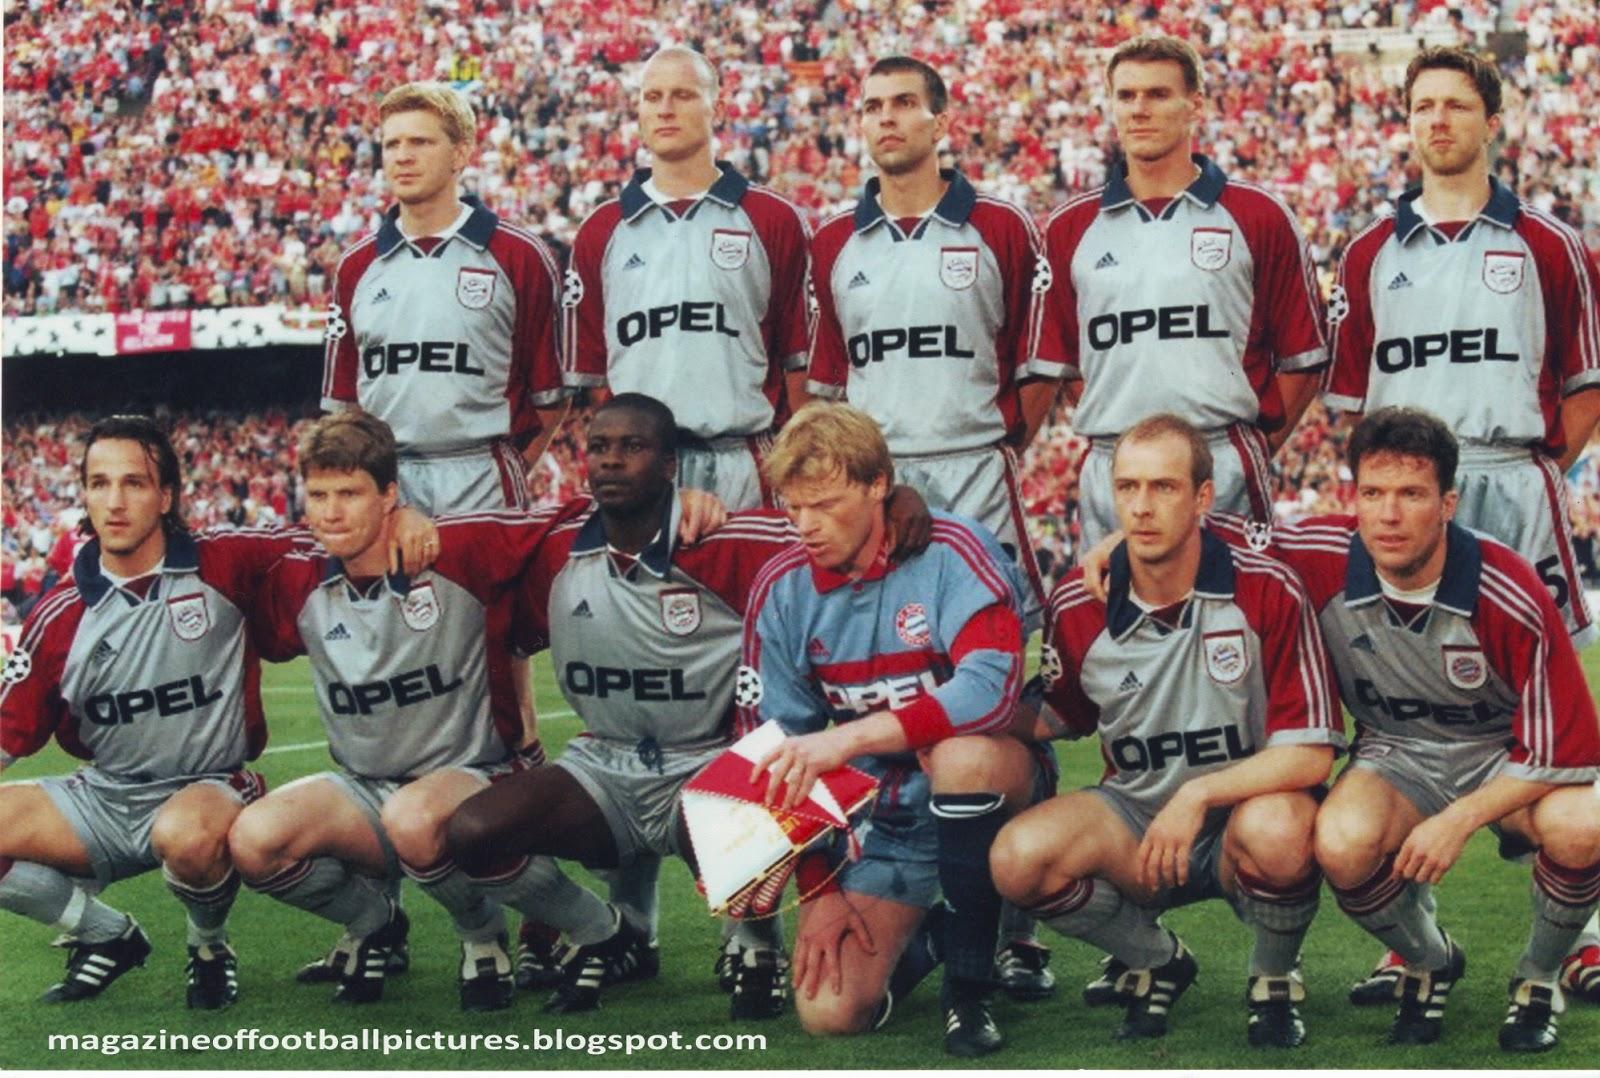 The Bayern Munich Team Before European Champions League Final Against Manchester United In Nou Camp Stadium Barcelona Spain